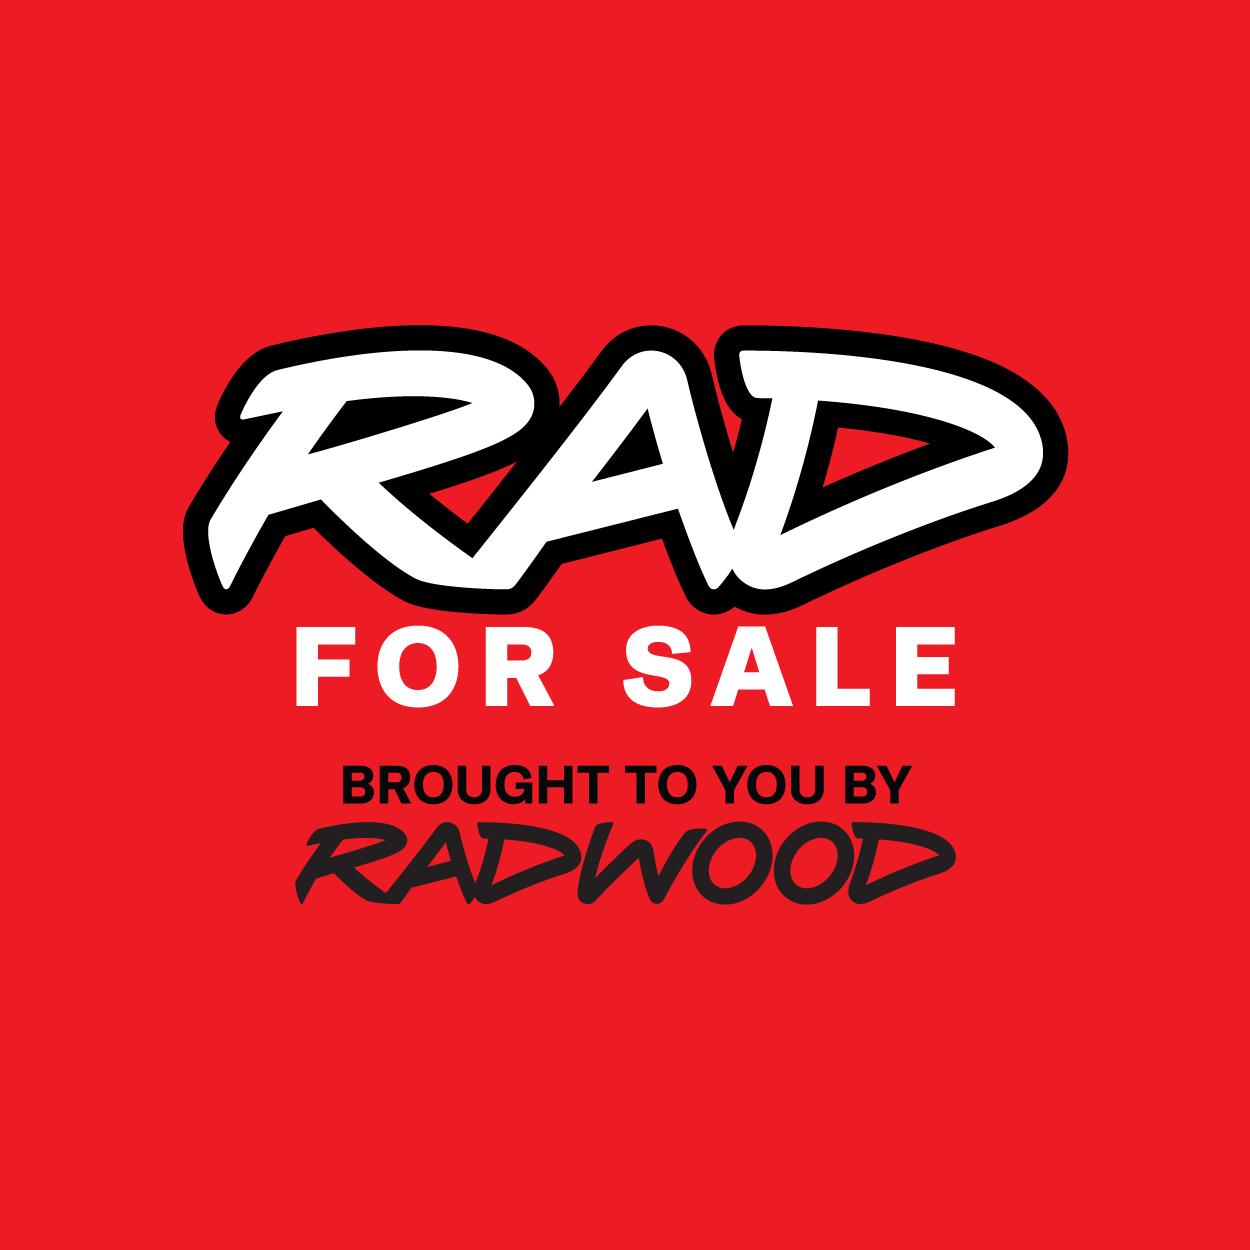 Rad For Sale